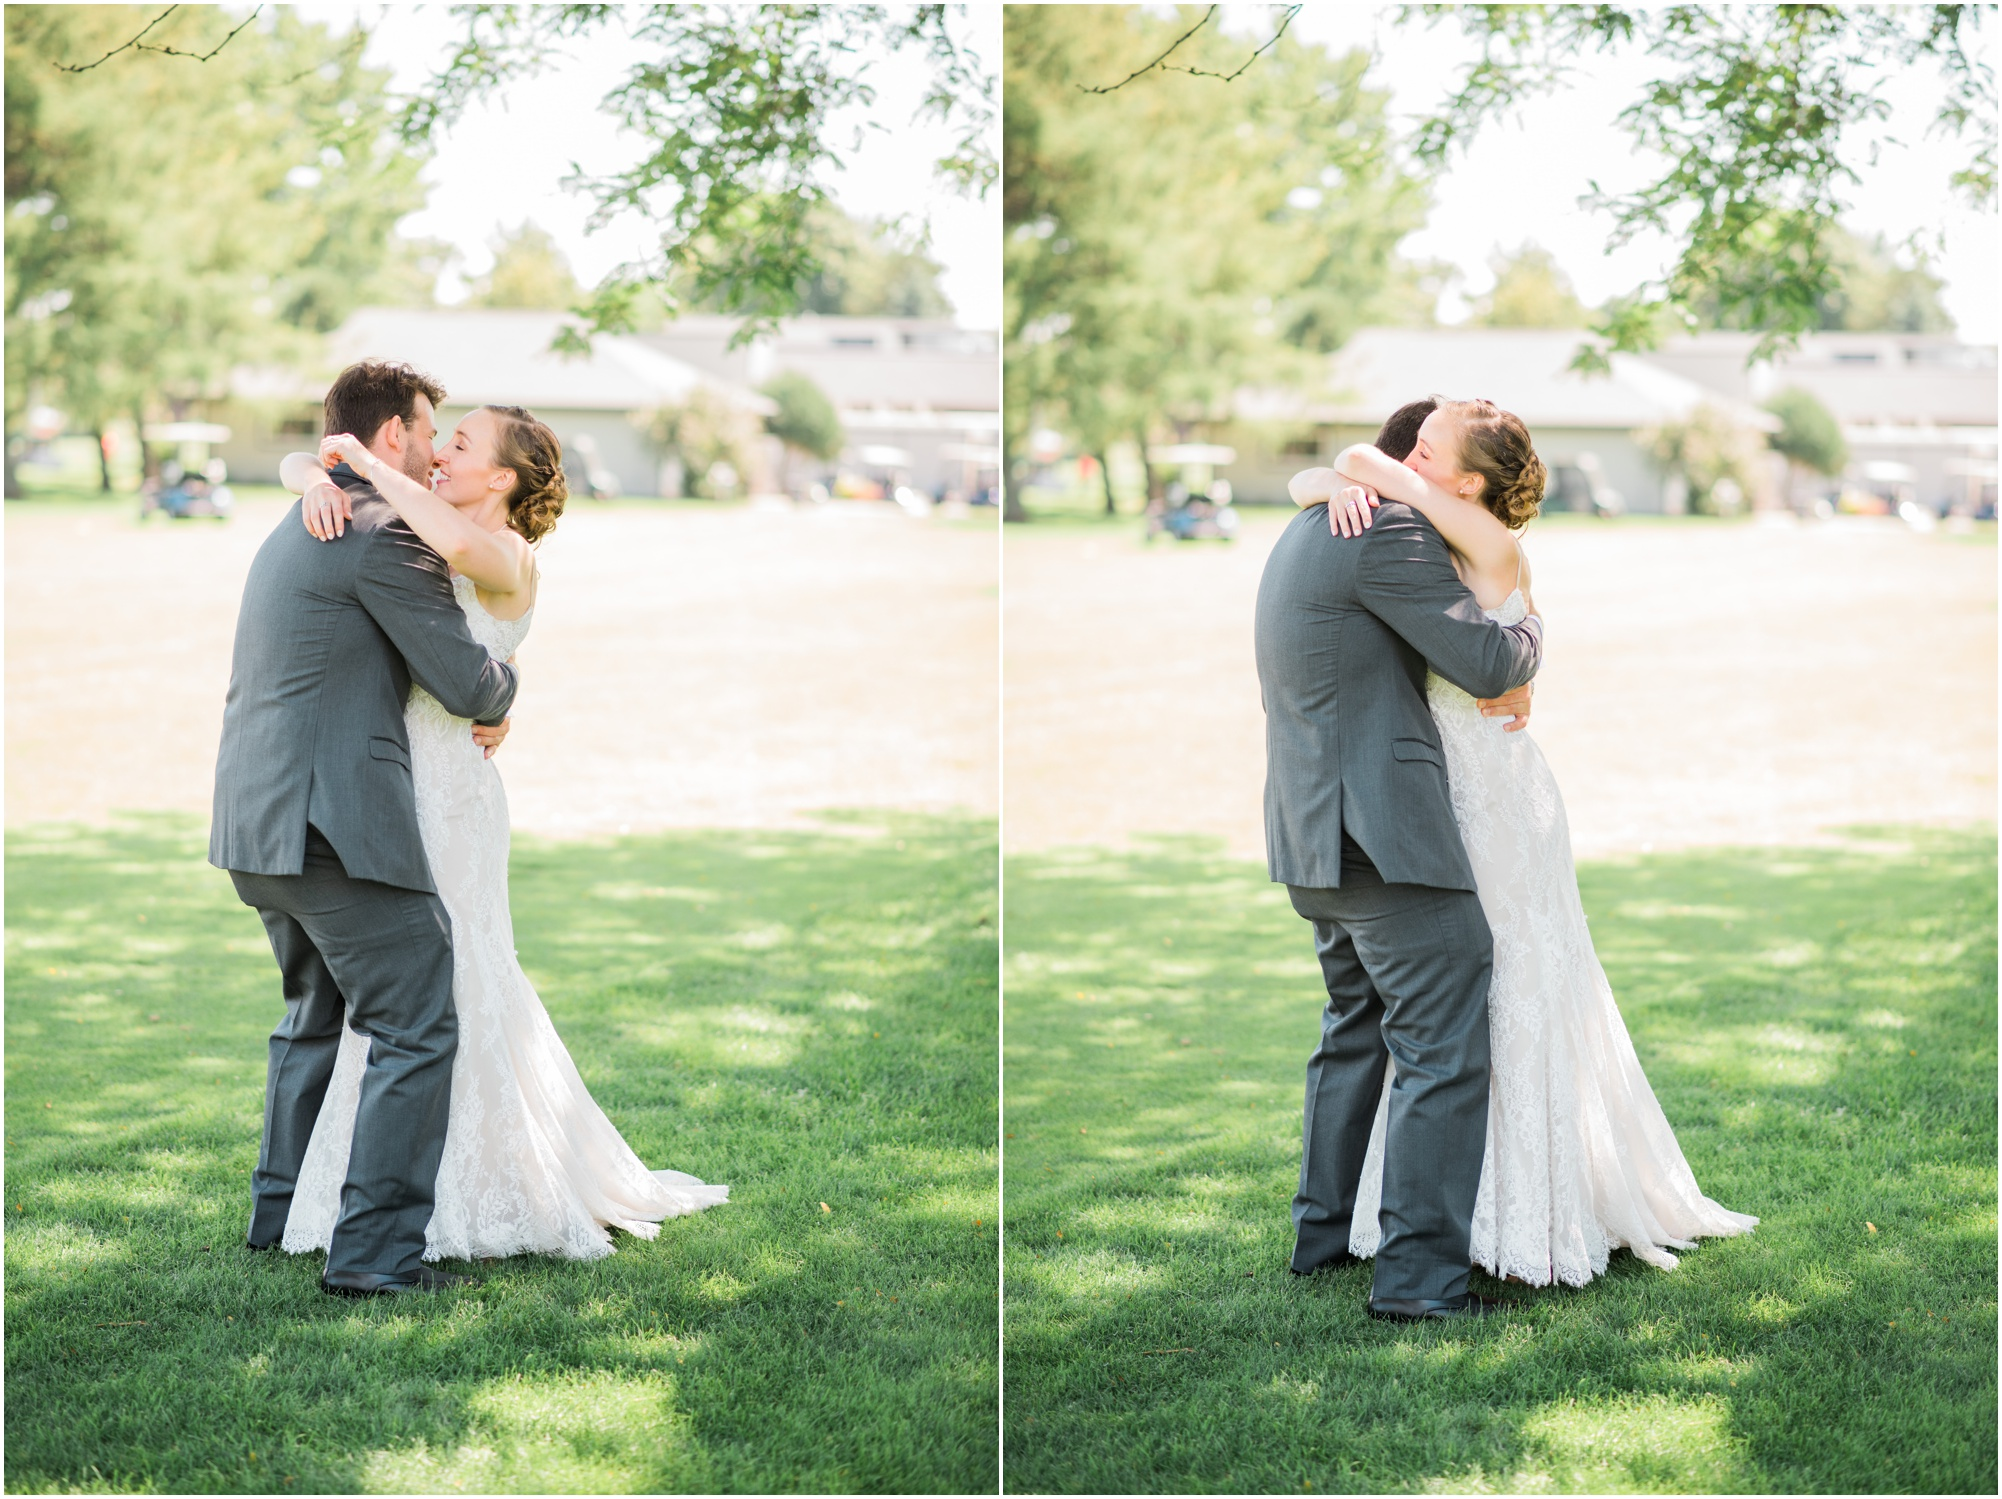 Wisconsin-Wedding-Photographer-Reedsburg-Country-Club-Kaela-and Matt-Wedding-39.jpg